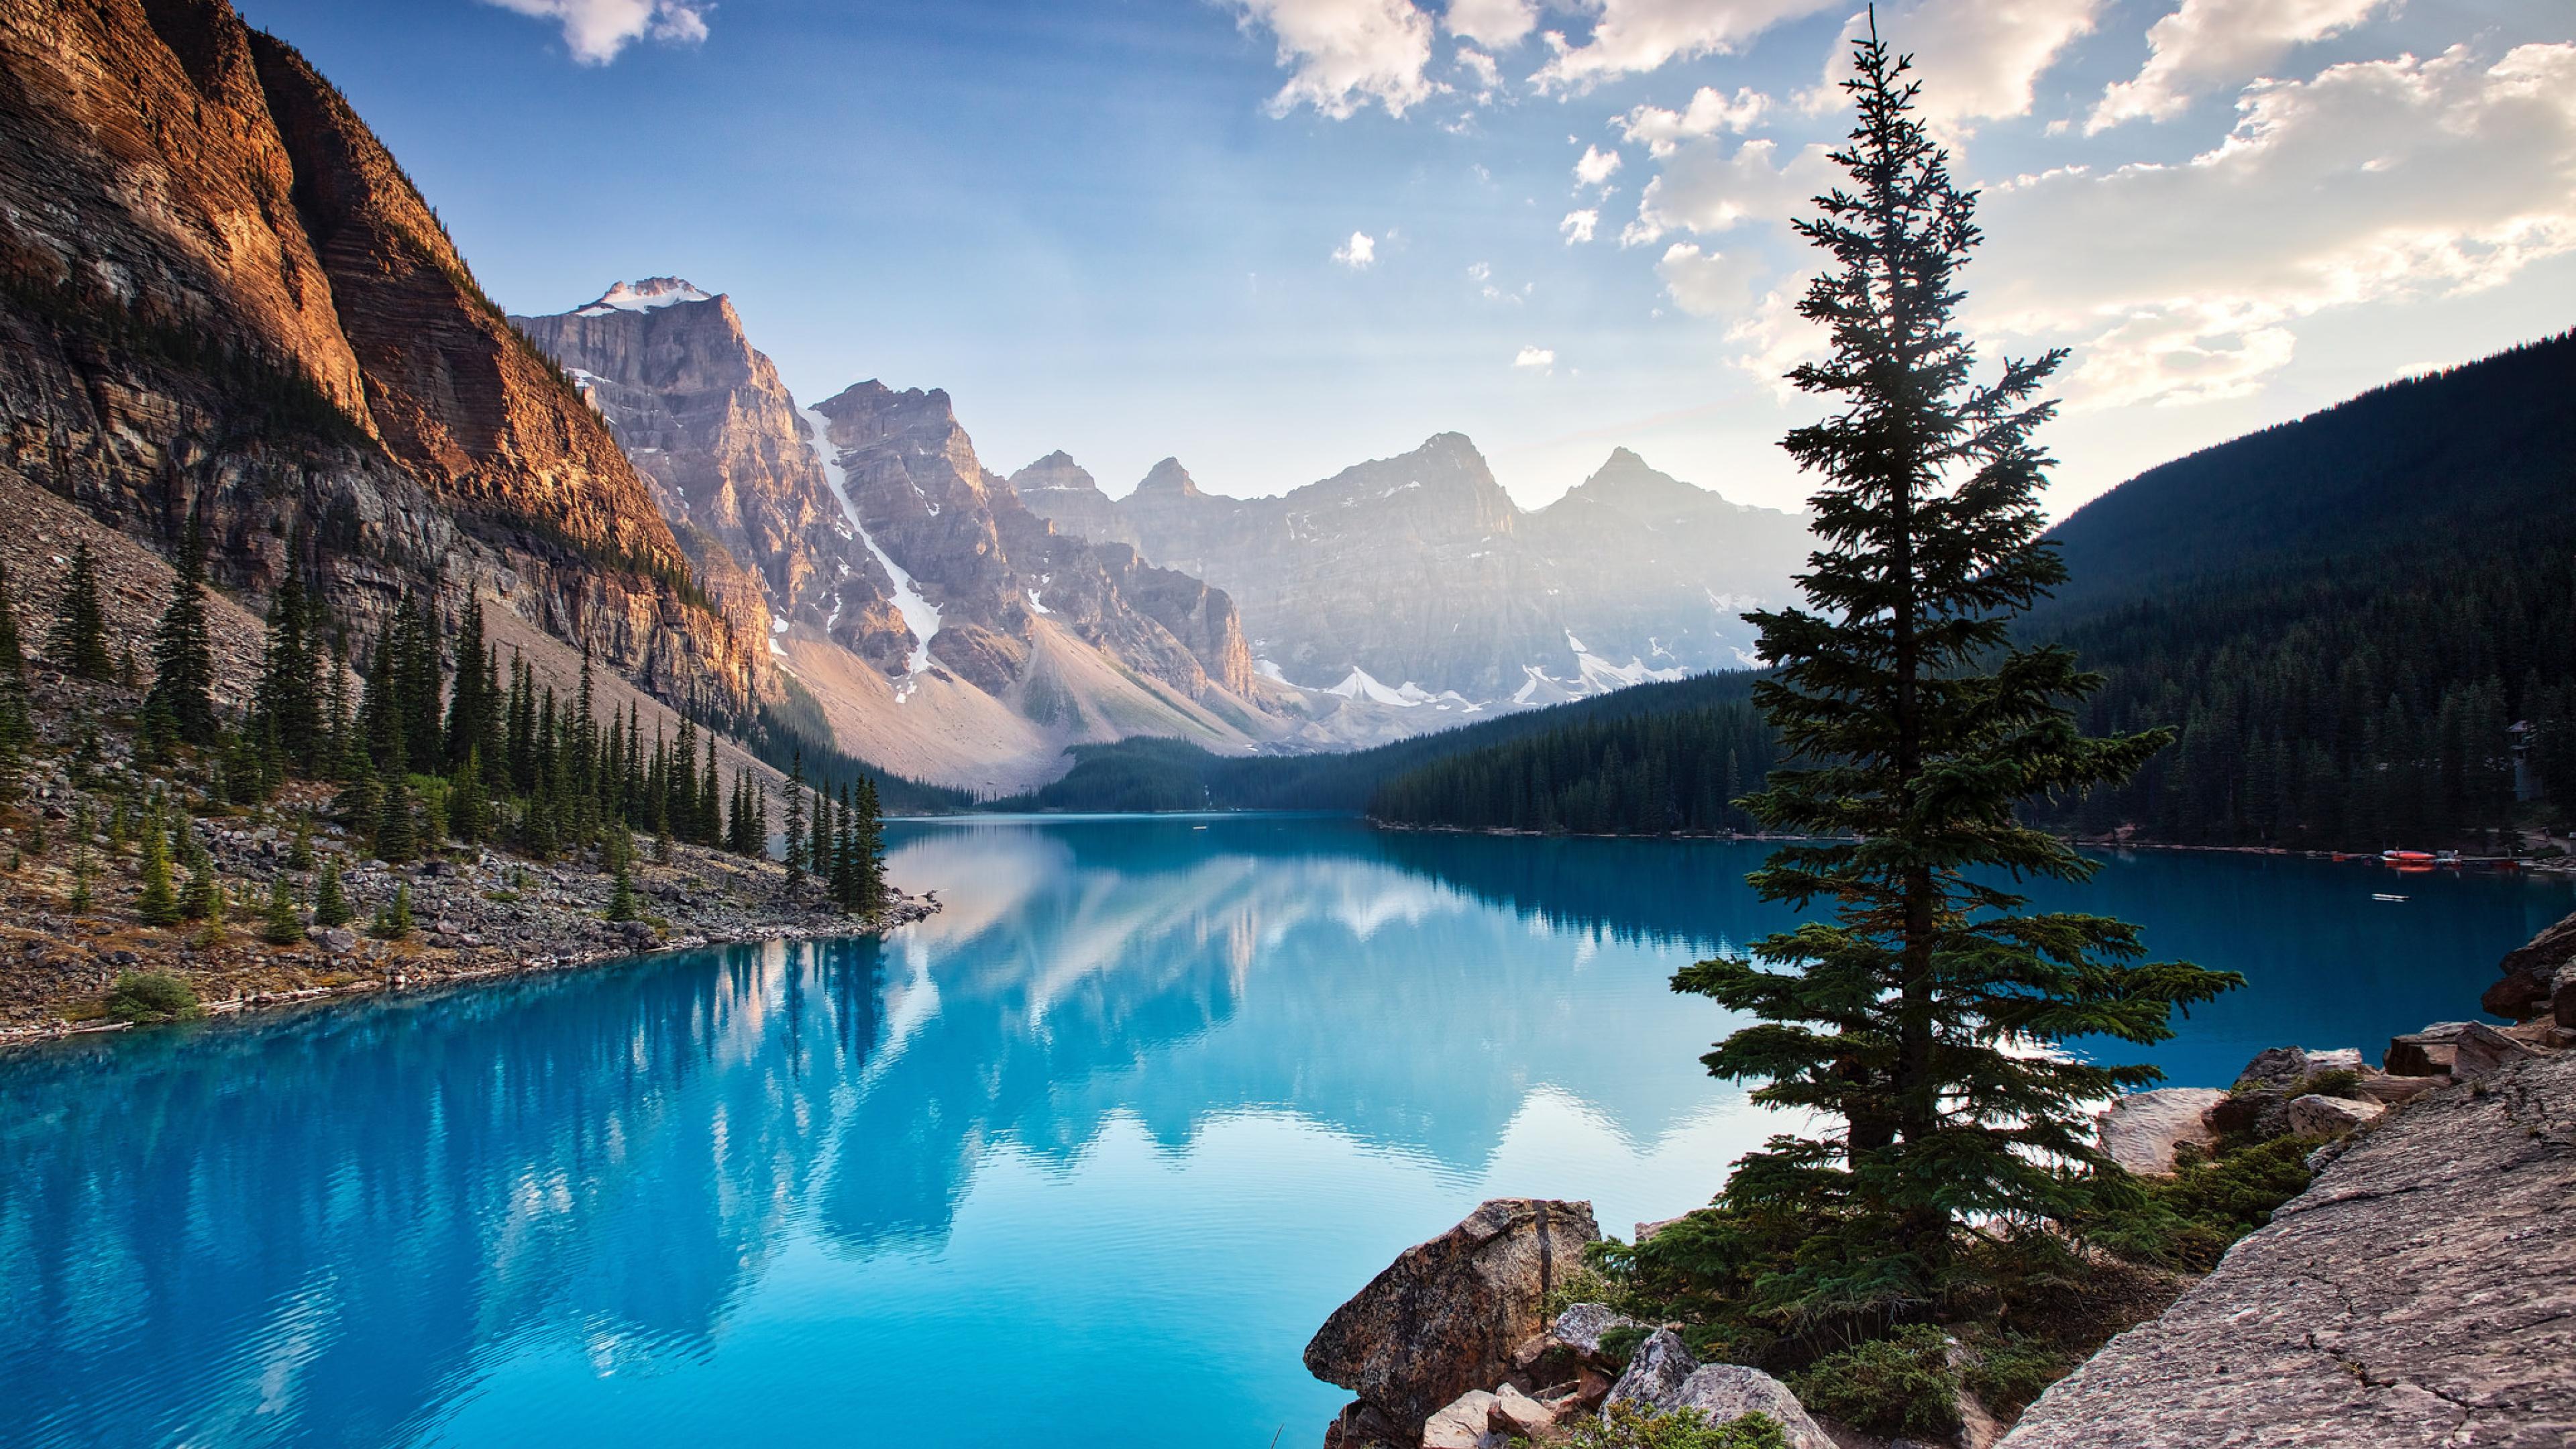 3840x2160 Moraine Lake South Channel 4k Wallpaper Hd Nature